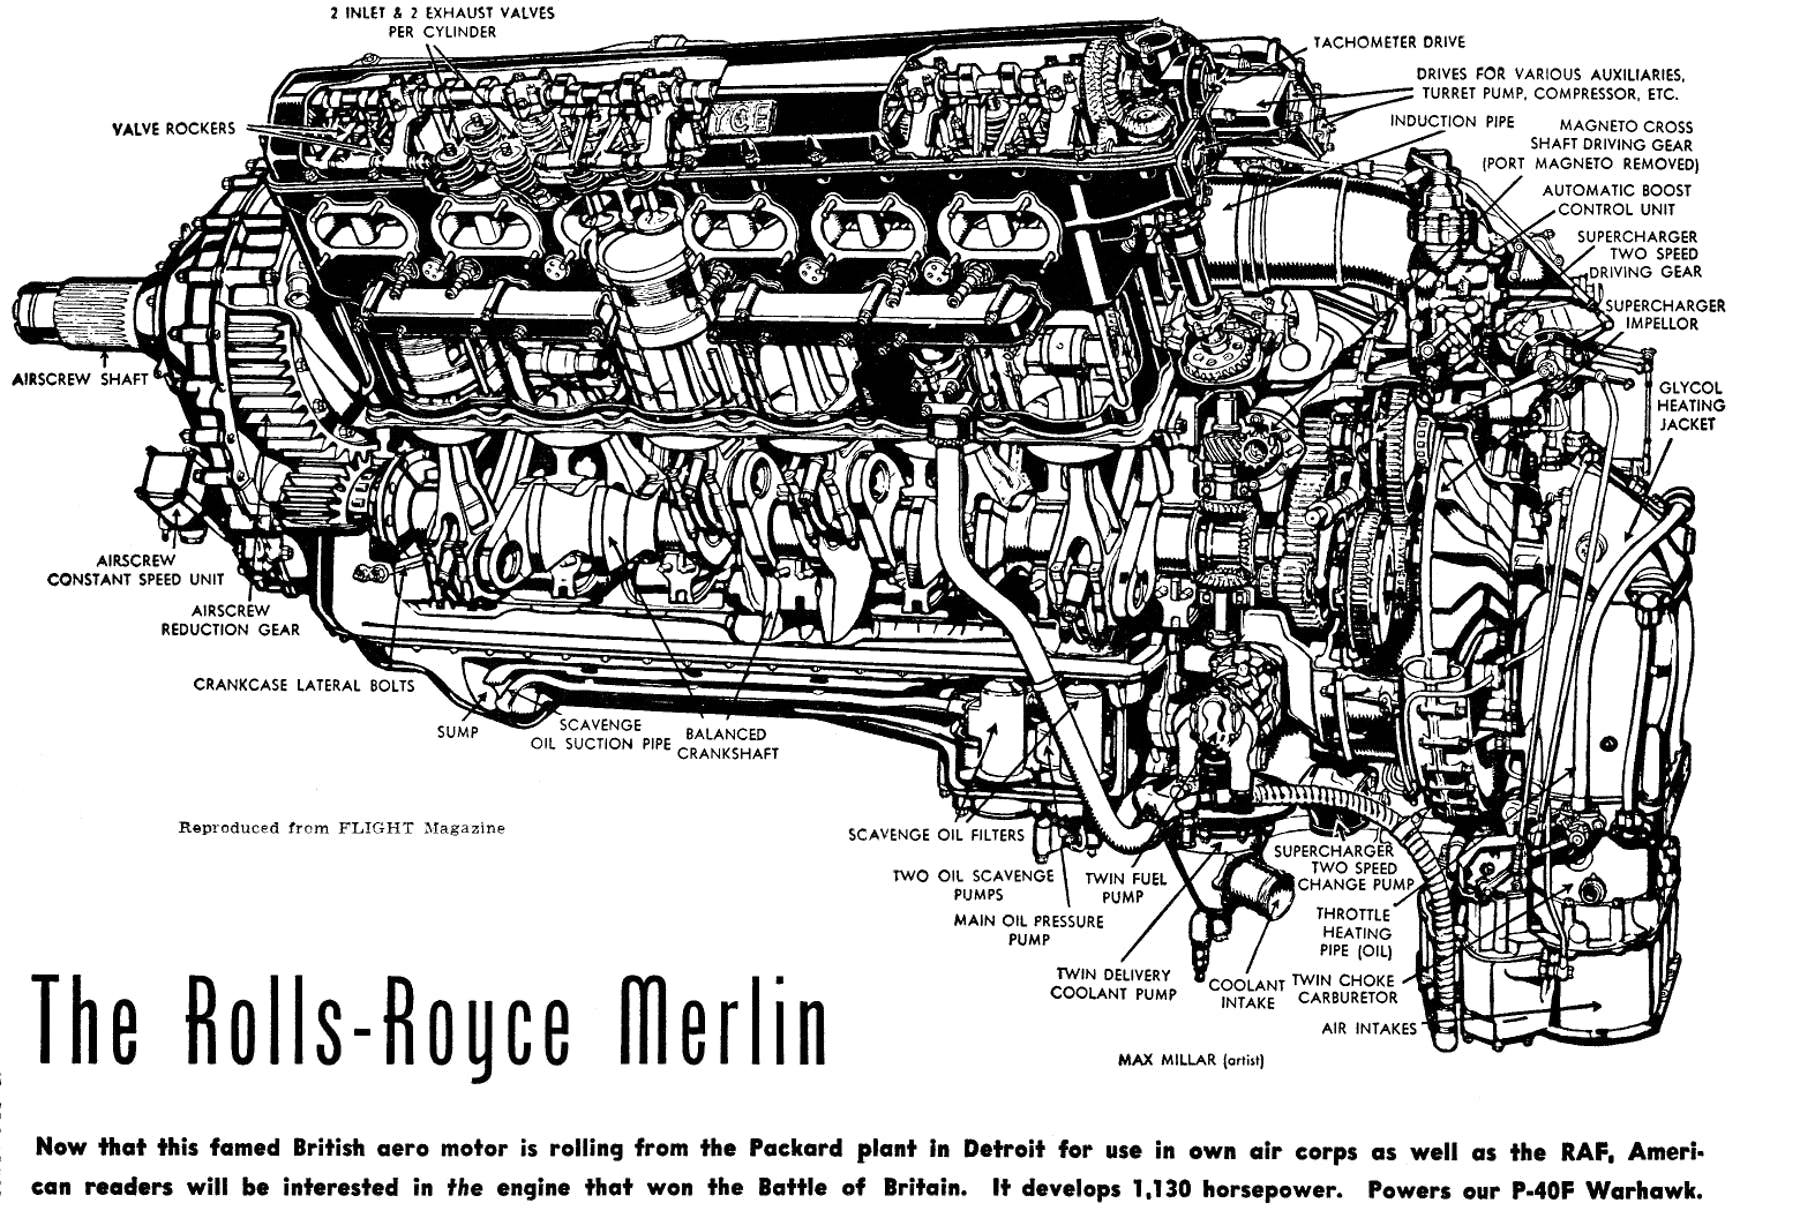 Documentary: Building The Rolls-Royce Merlin EngineSilodrome